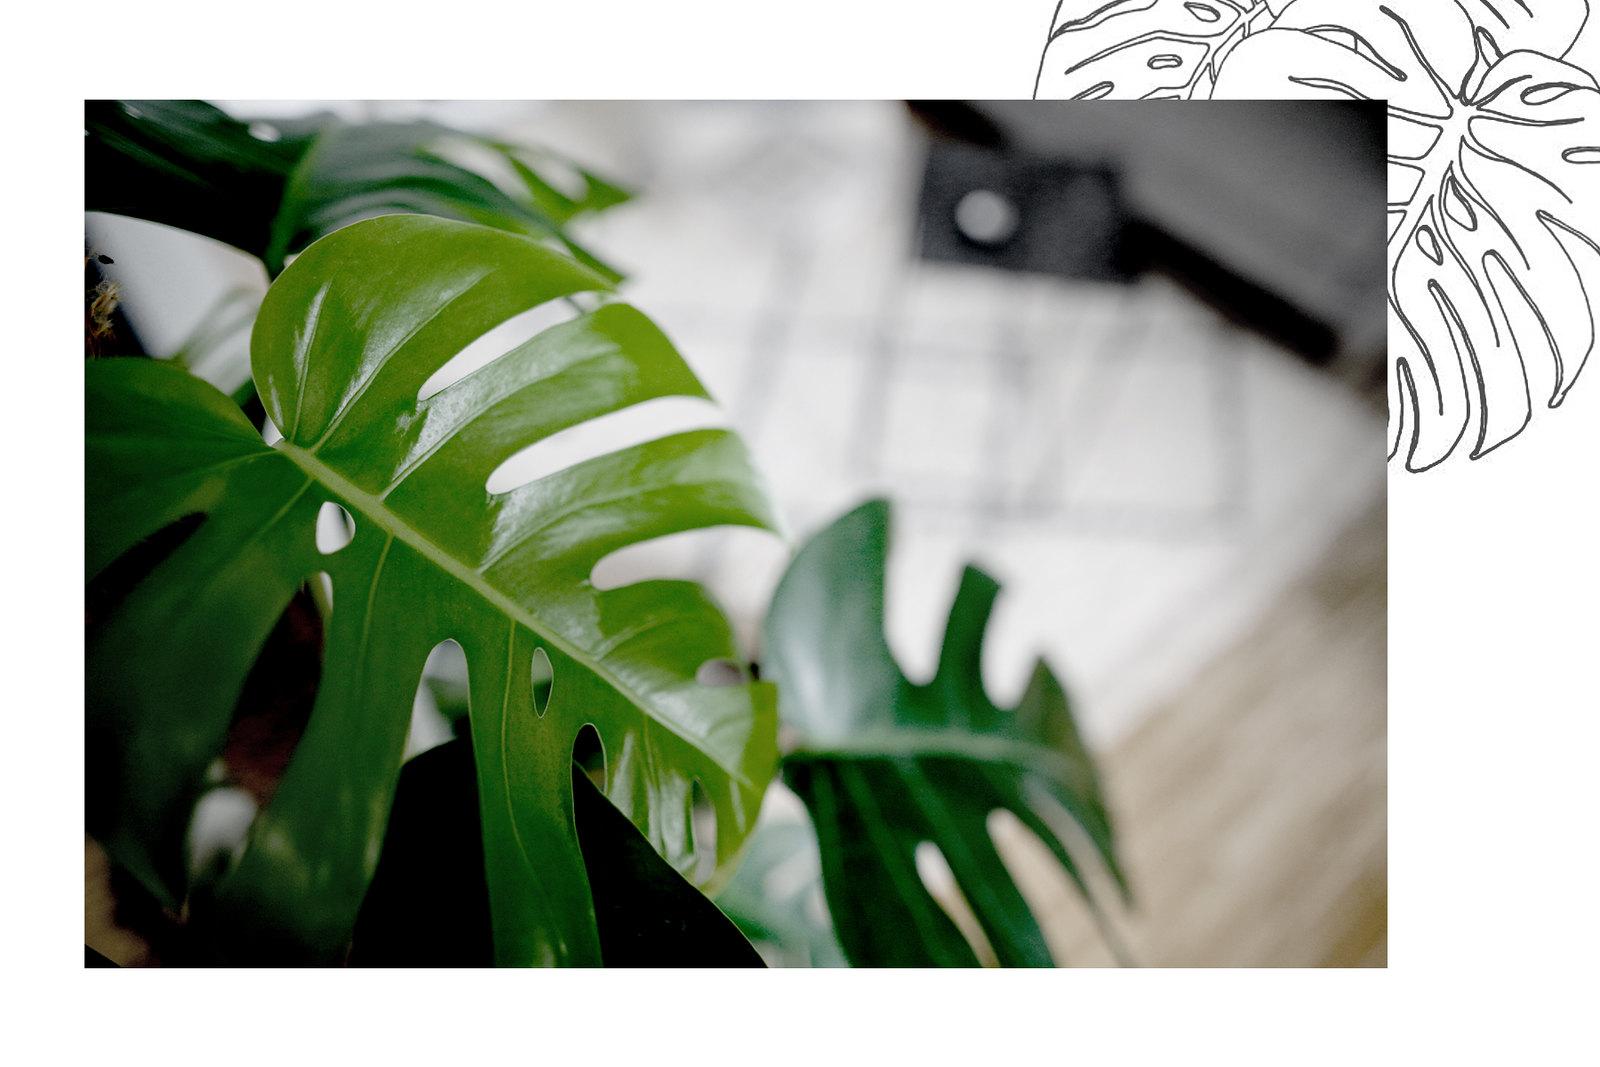 home interior loft loftlife loftliving home&living interior interiordesign decor styling lifestyle lifestyleblogger raum.freunde contour chair couch scandi design scandinavian moroccan beni ourain rug living-room minimal cats & dogs ricarda schernus 5